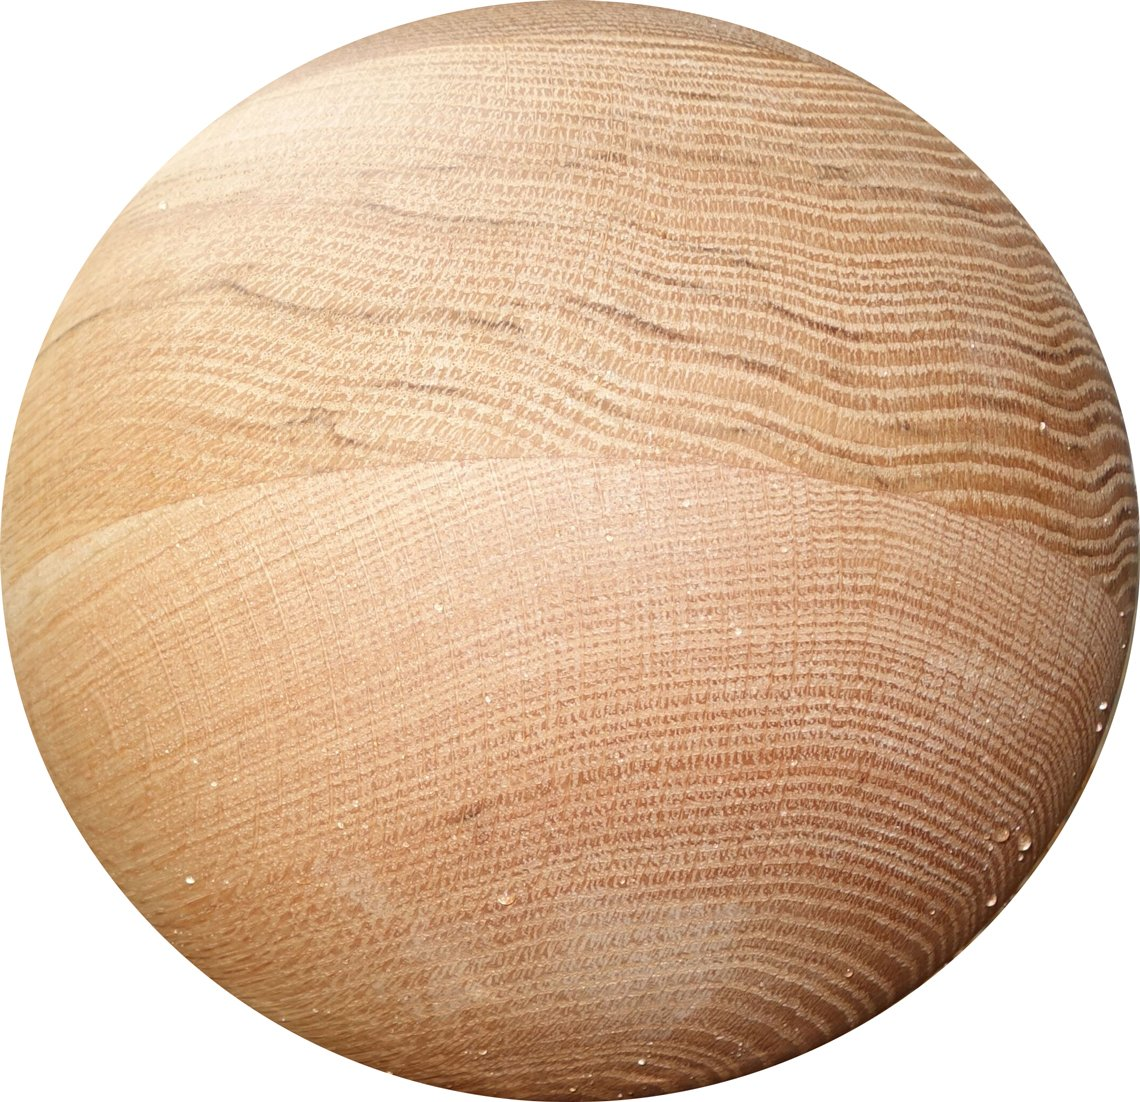 Tai Chi Ball - SMALL / Beginner Wood Tai Chi Ball (YMAA) 2-3 lbs, 6 inches, poplar. MADE IN THE USA Use with Tai Chi DVD